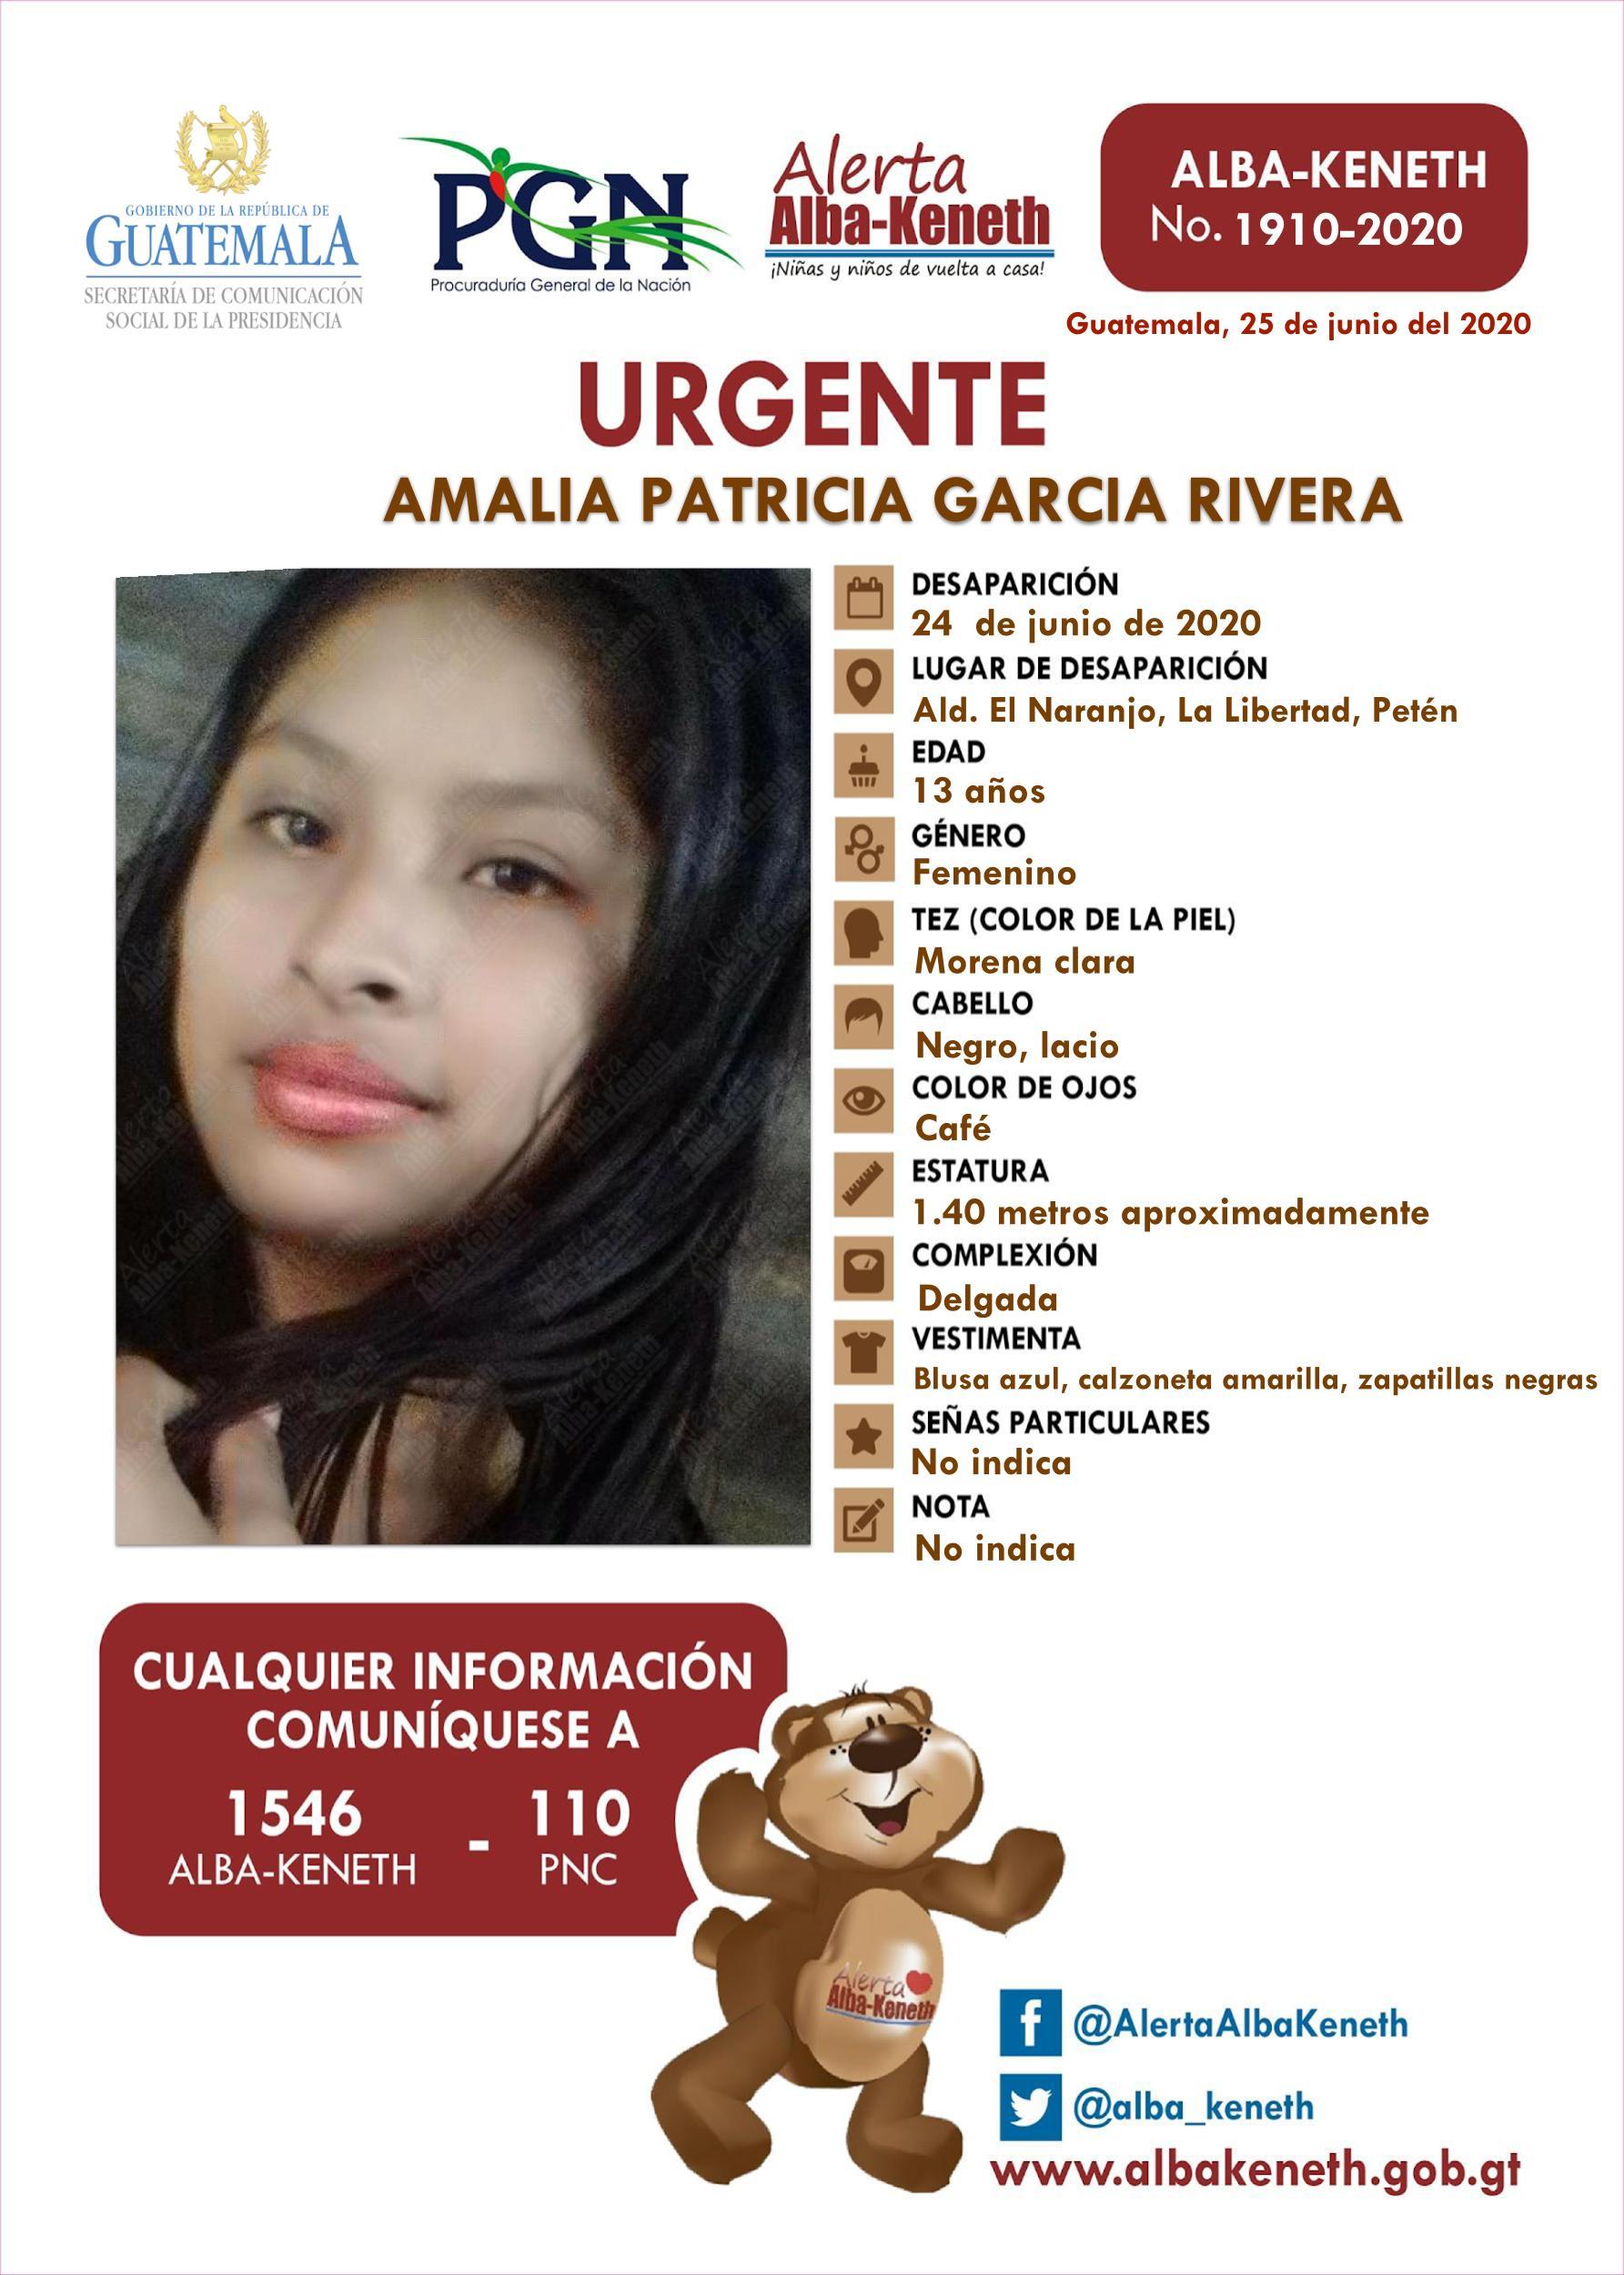 Amalia Patricia Garcia Rivera